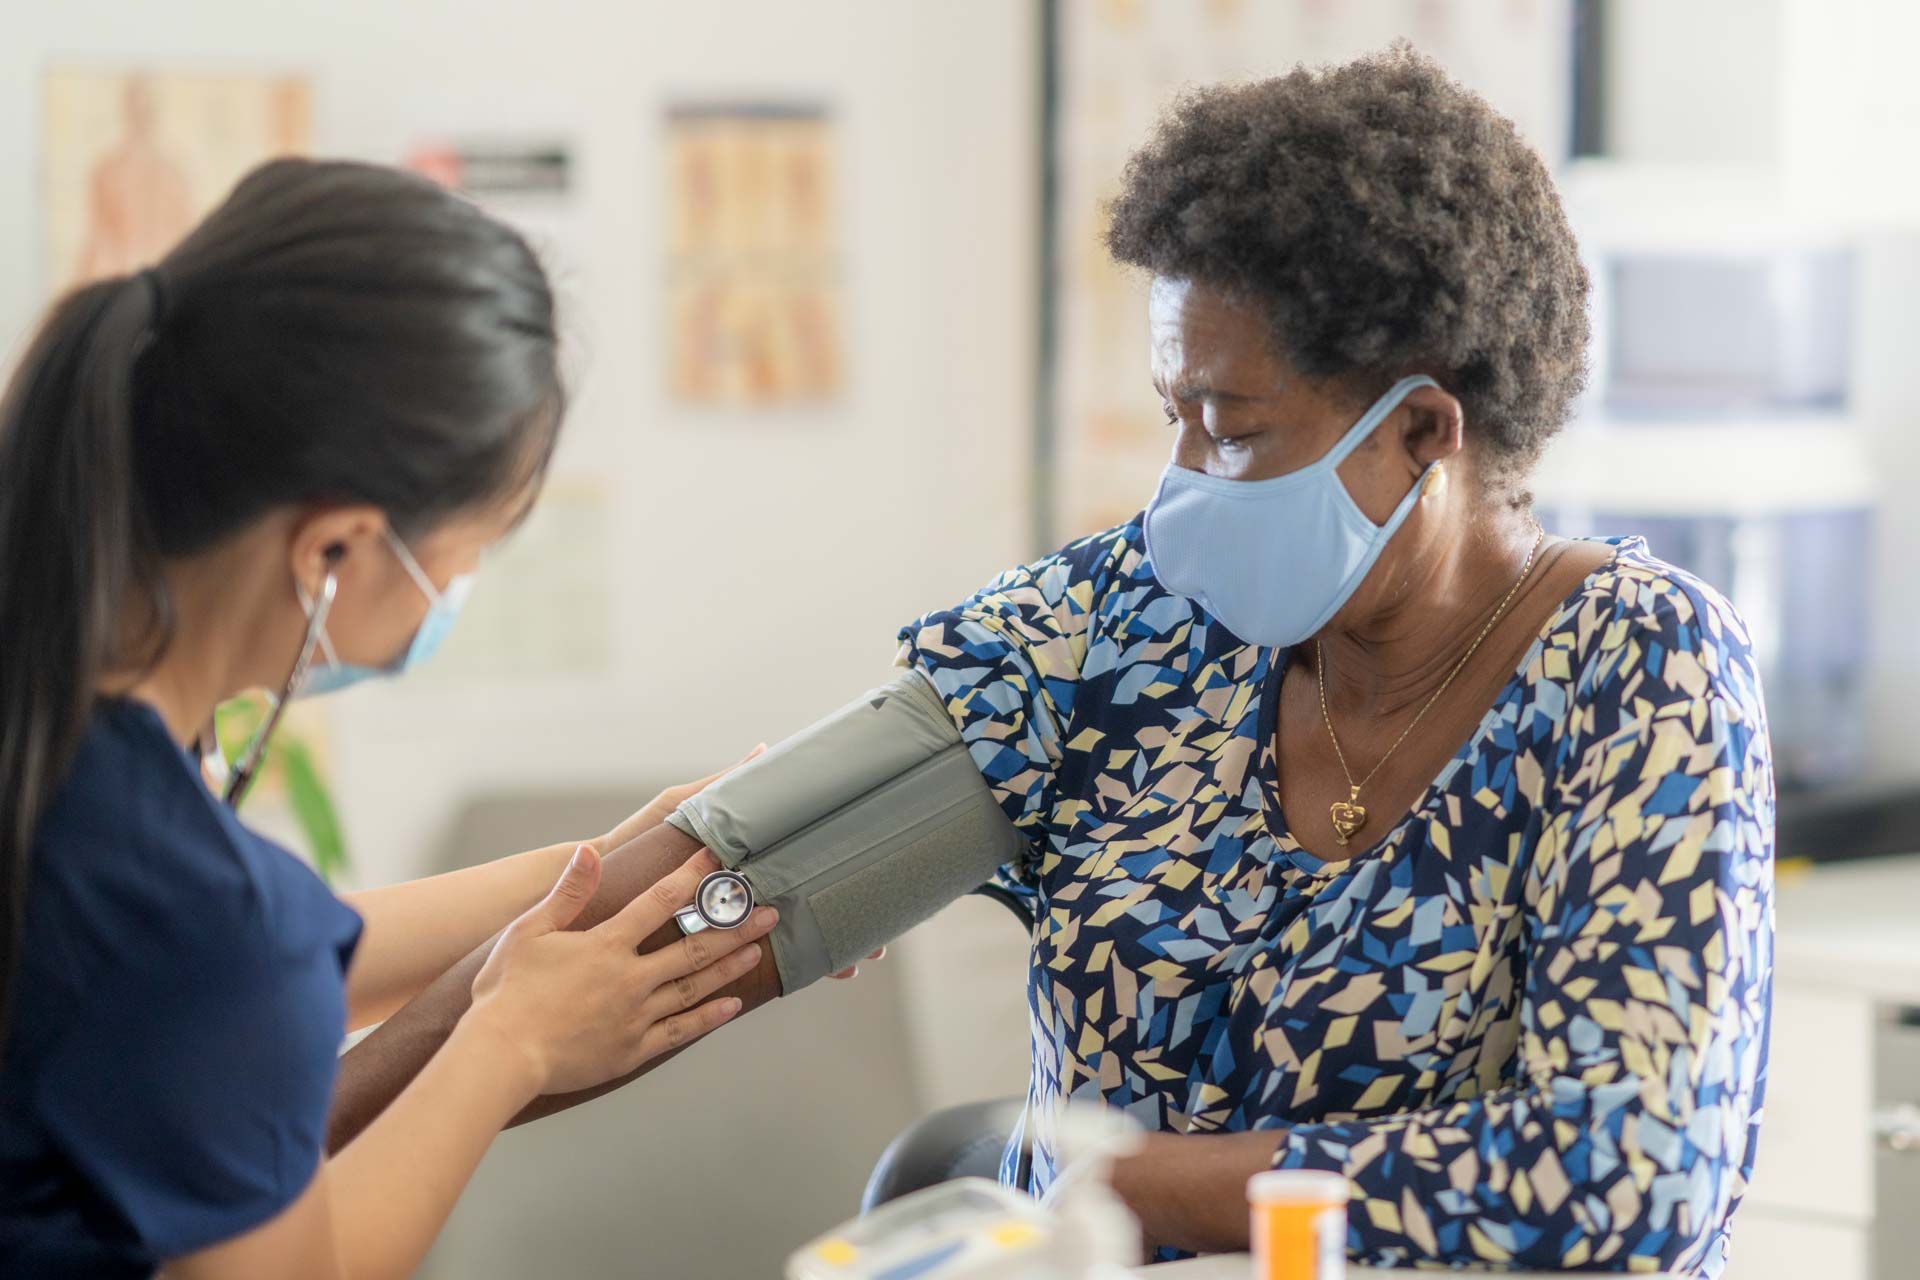 nurse taking blood pressure of woman